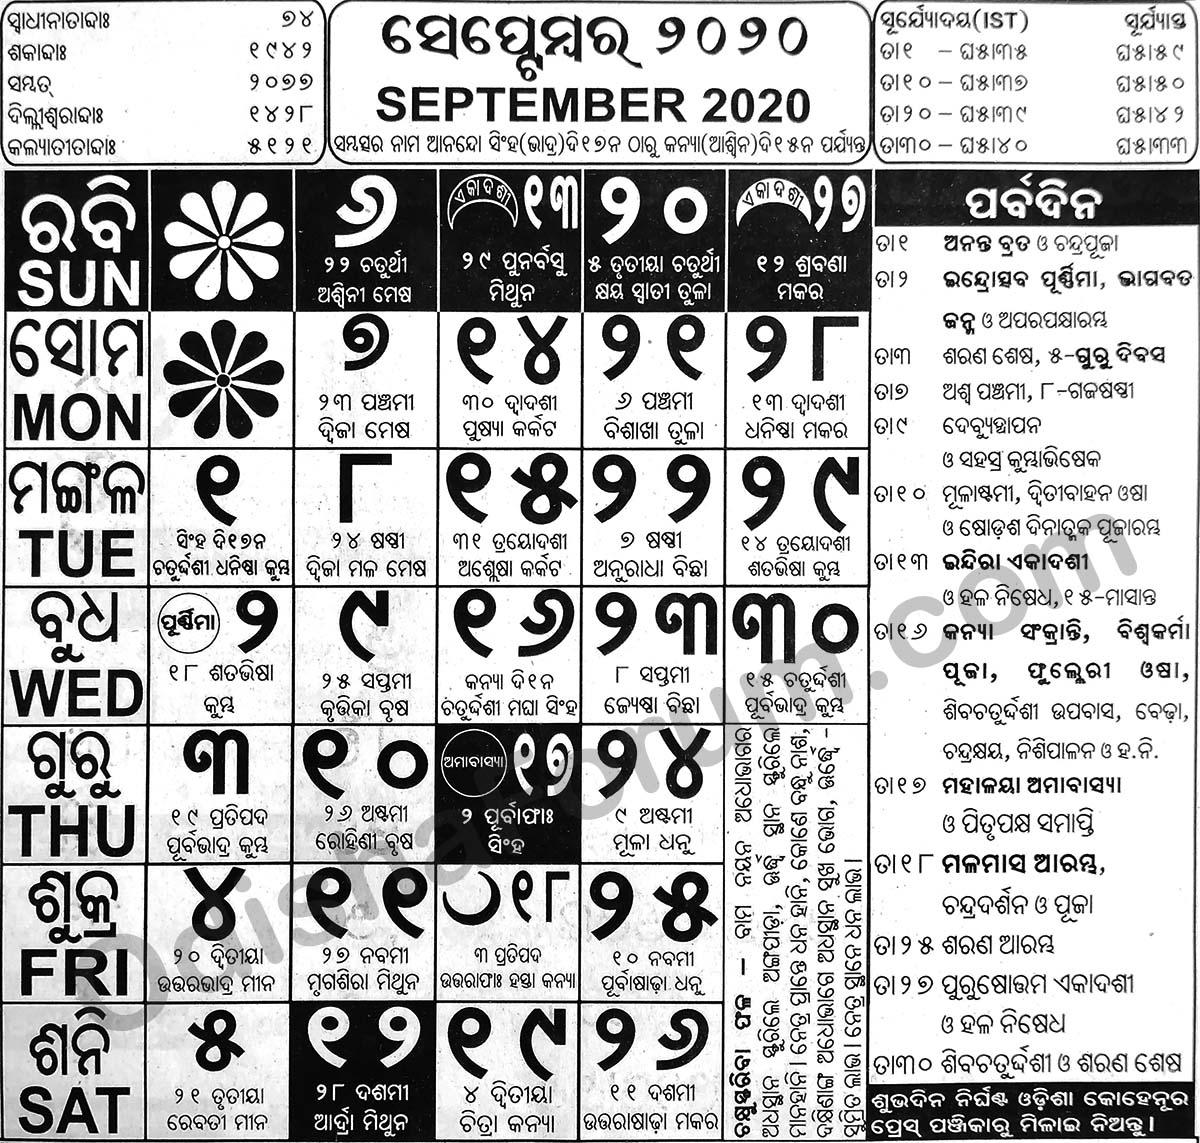 2020 September Oriya Calendar